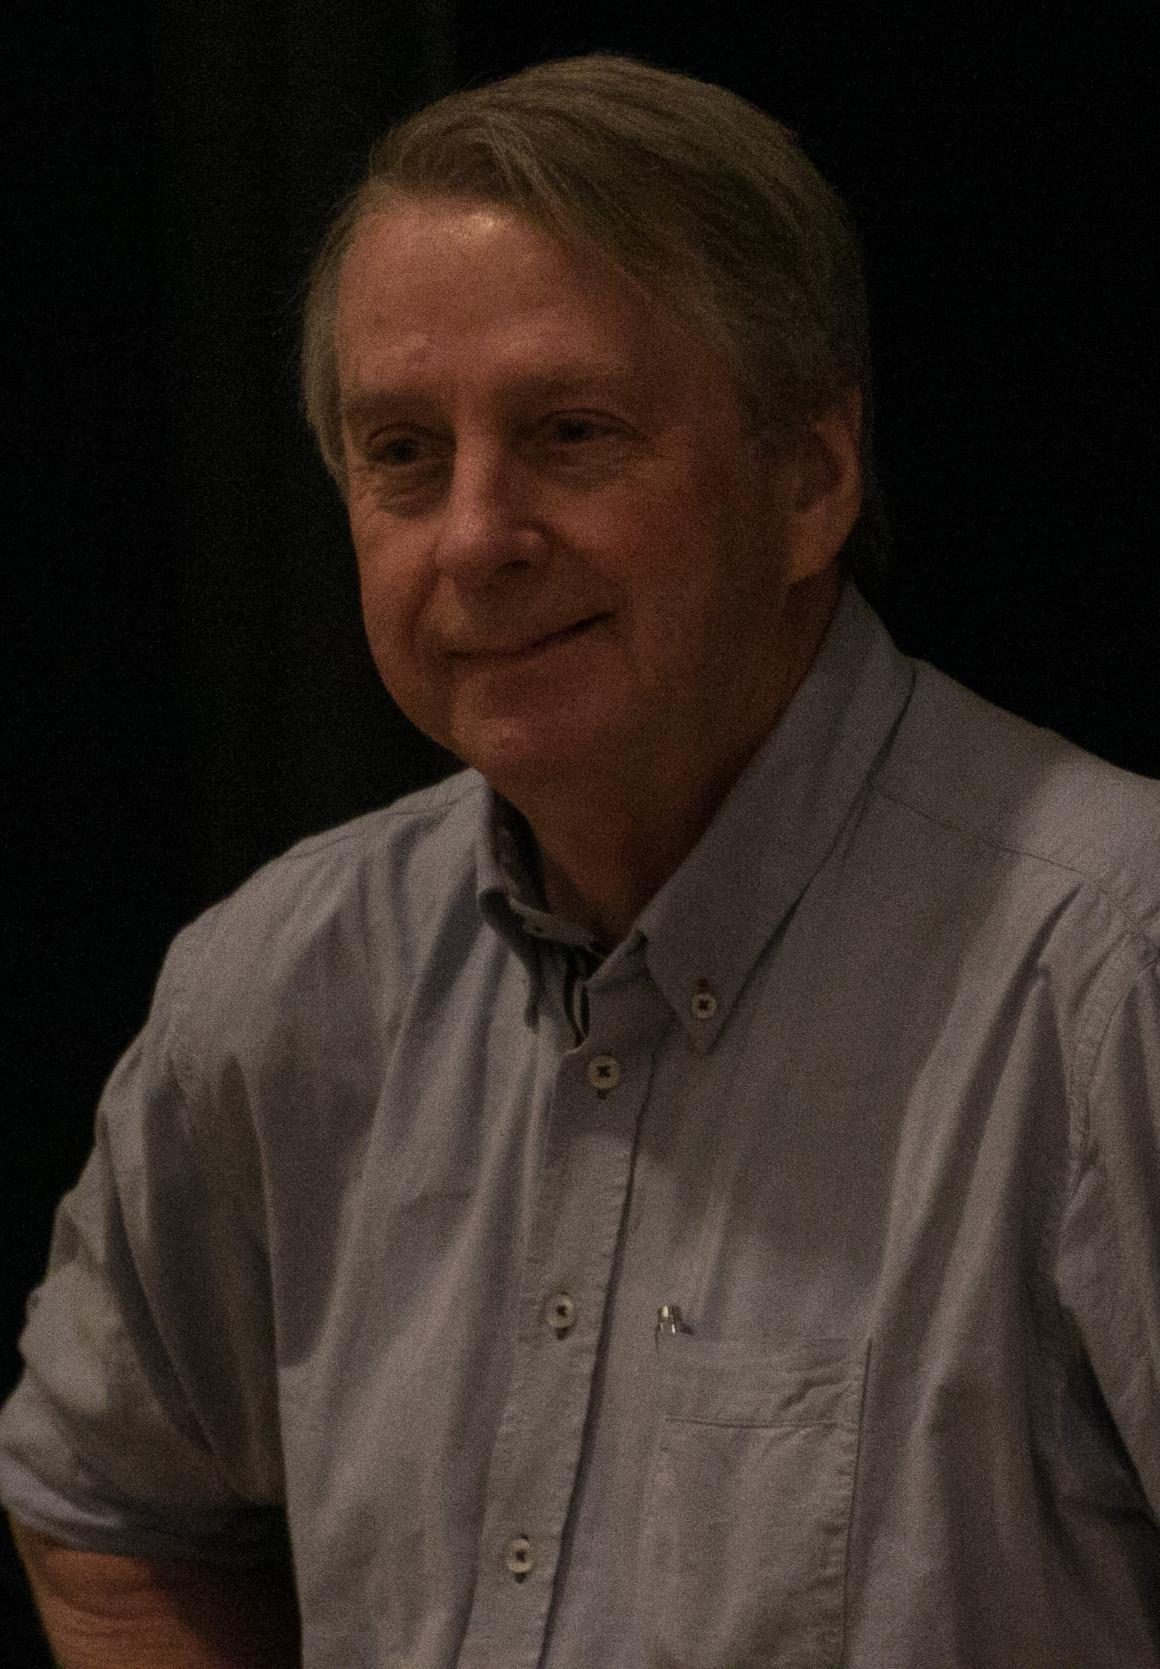 john engelbrecht citater John Engelbrecht: Tankespind i højhastighedstempo | SønderborgNYT john engelbrecht citater